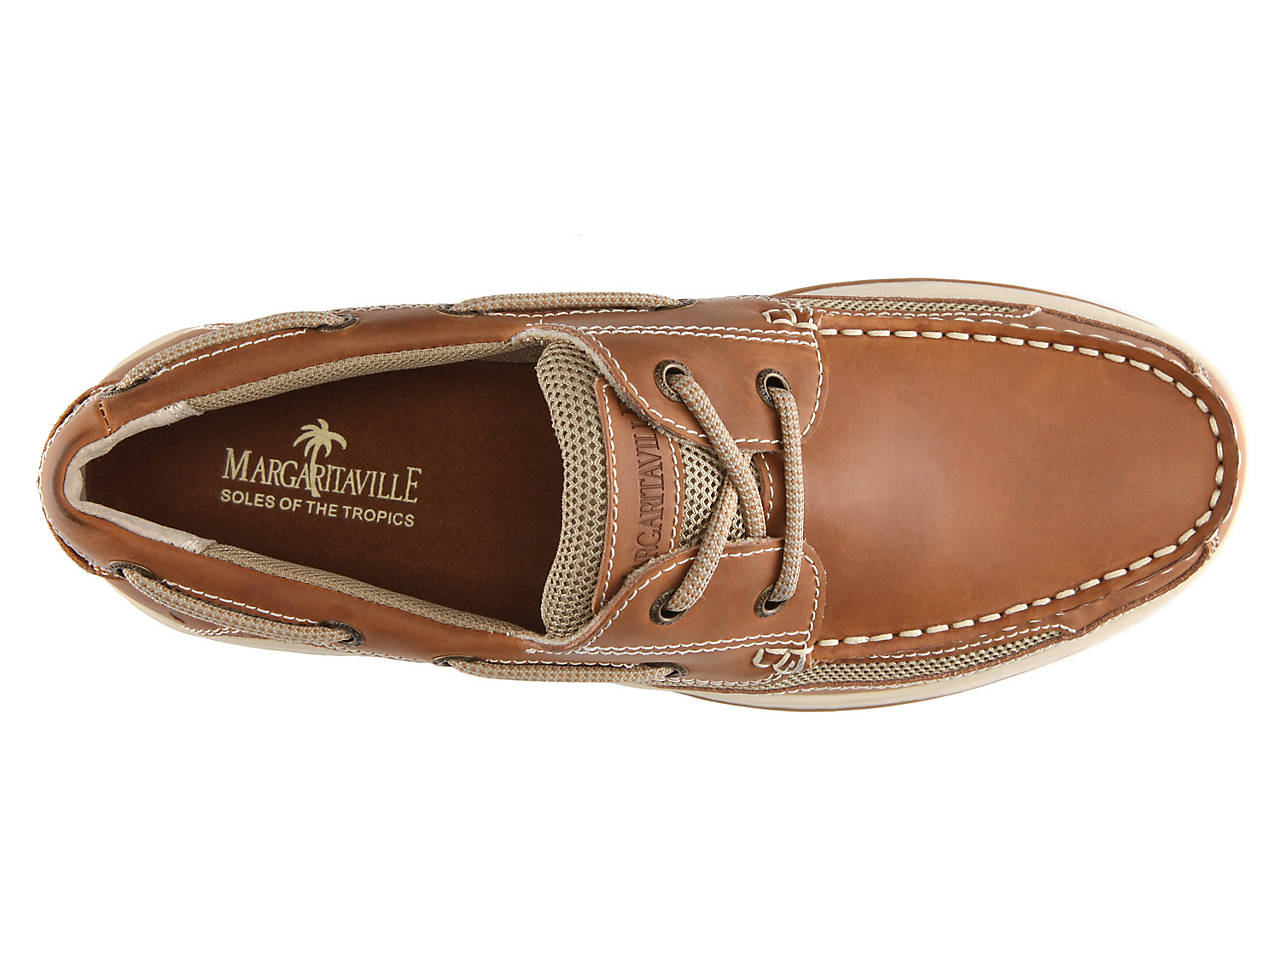 9b76d181982504 Margaritaville Anchor Boat Shoe Men s Shoes